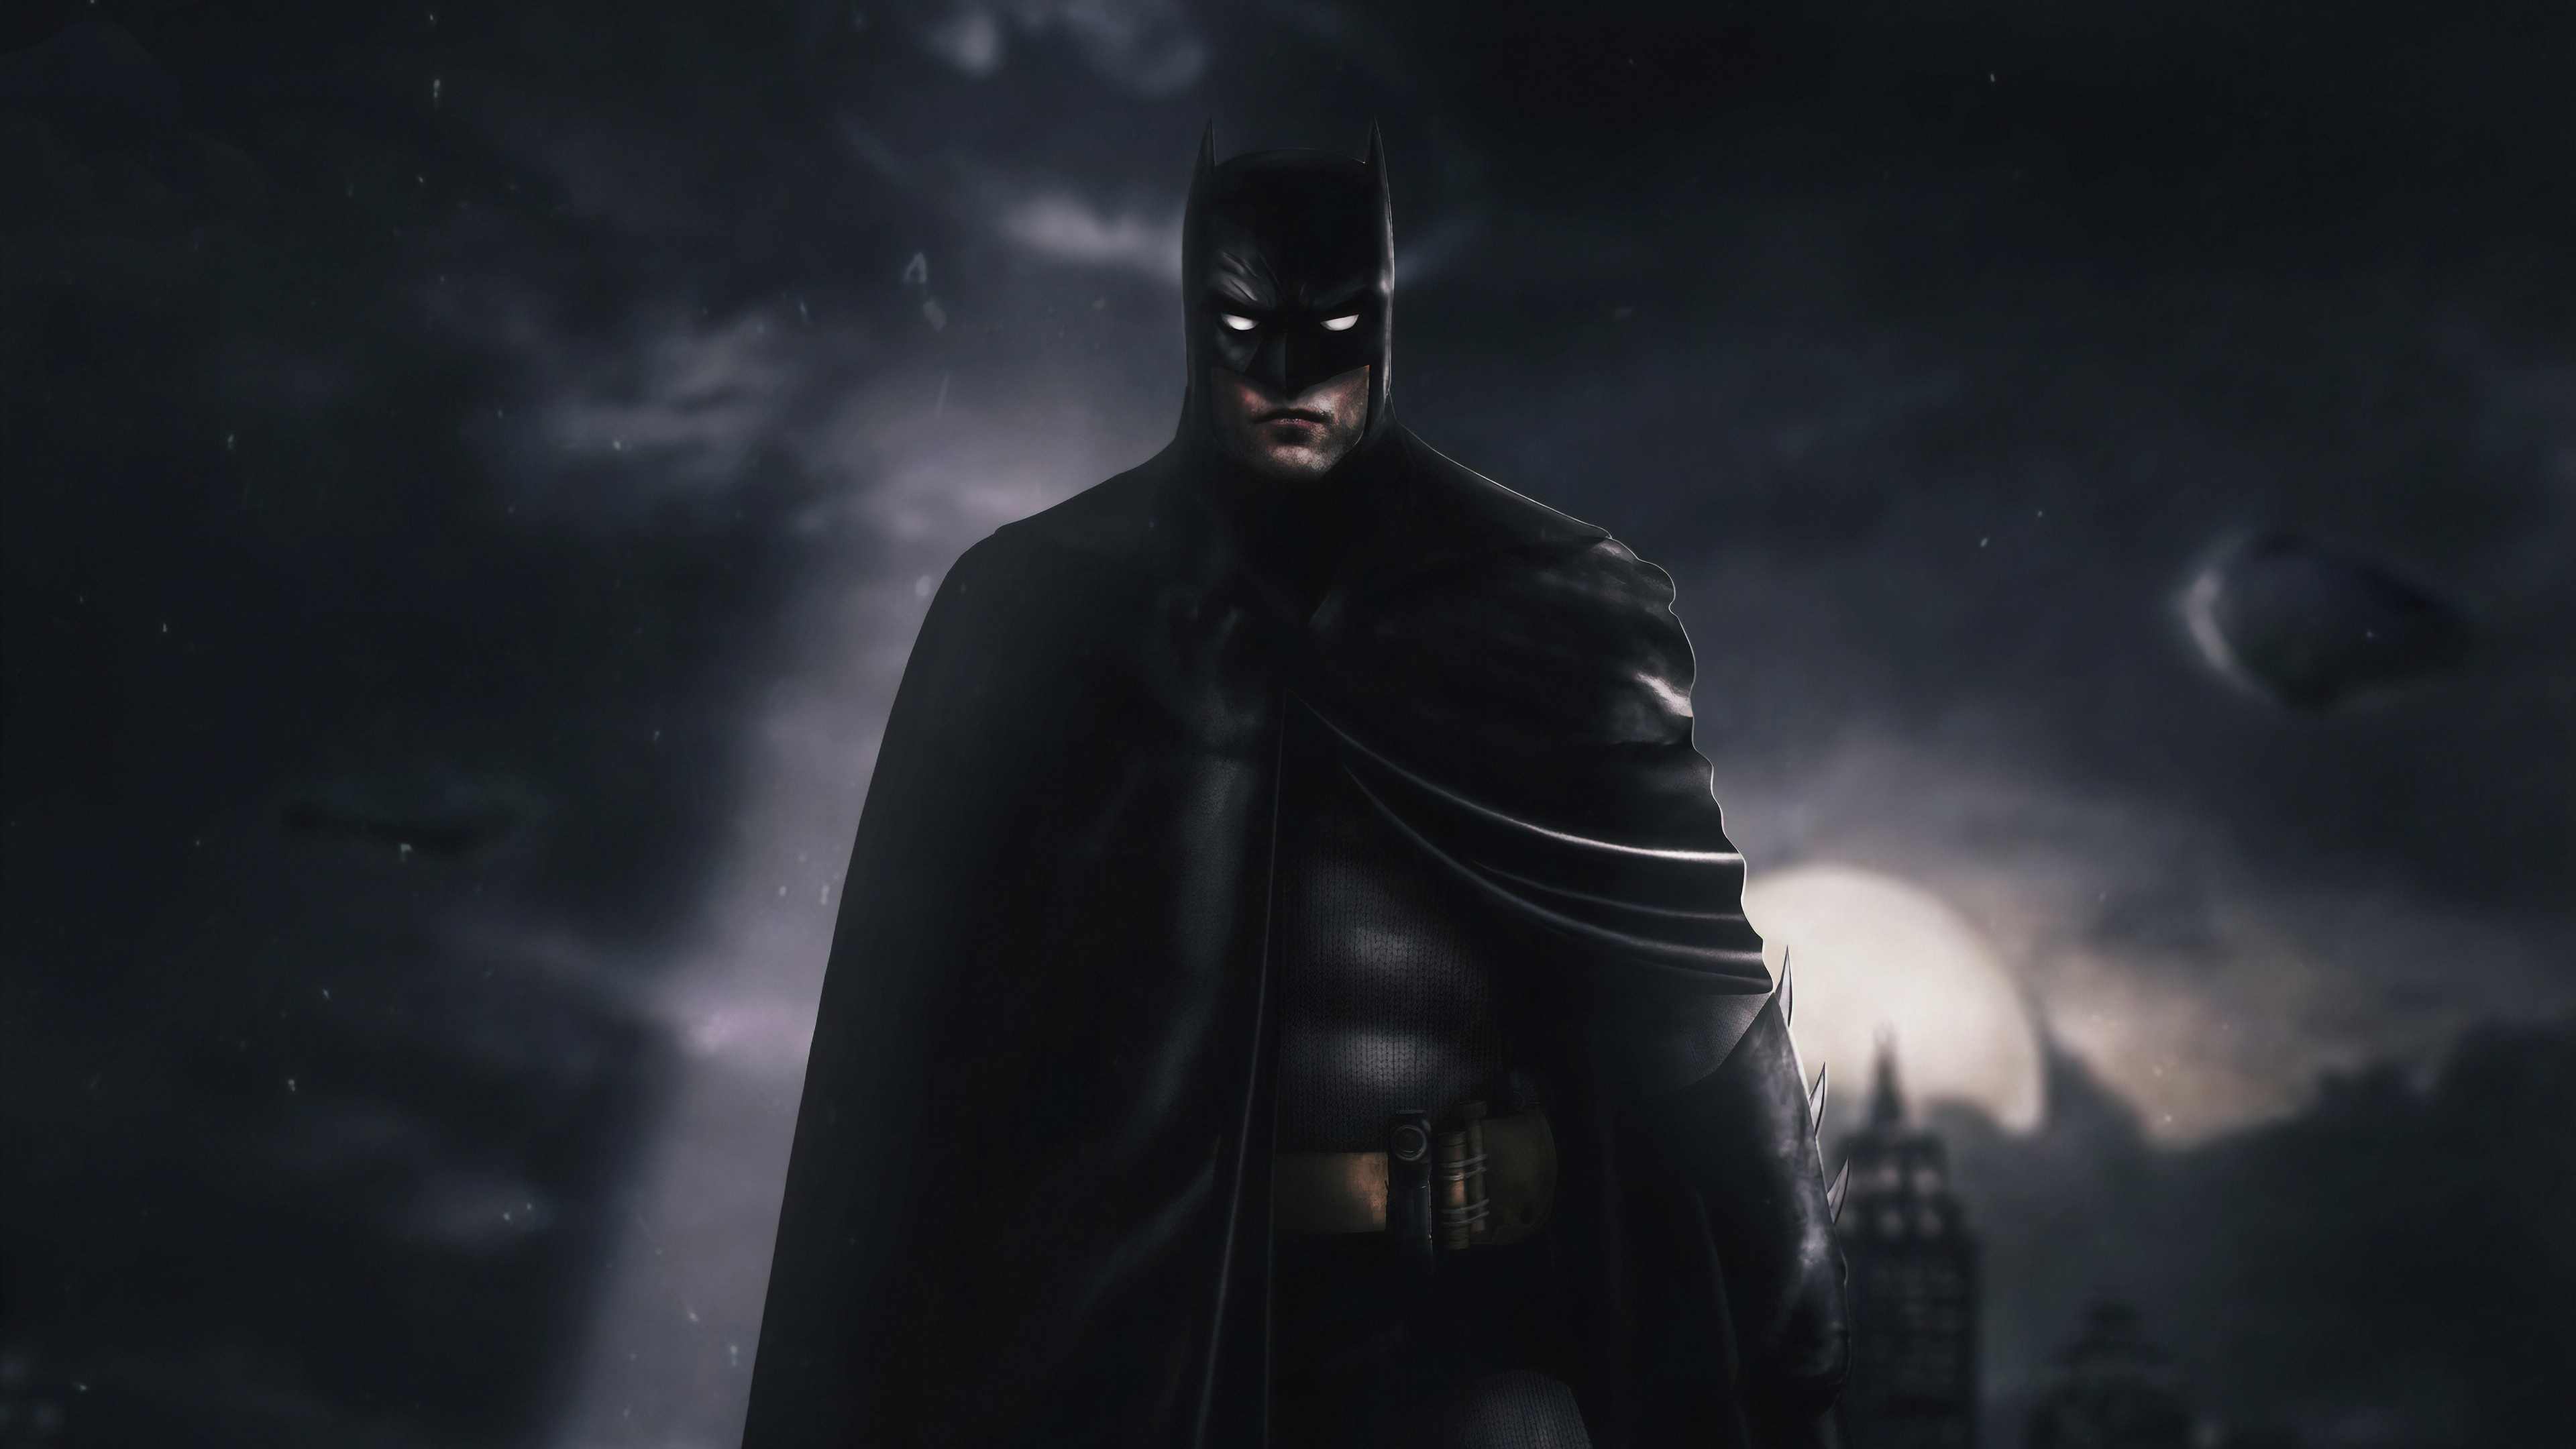 robert pattison new batman art 1570394824 - Robert Pattison New Batman Art - superheroes wallpapers, hd-wallpapers, digital art wallpapers, batman wallpapers, artwork wallpapers, 4k-wallpapers